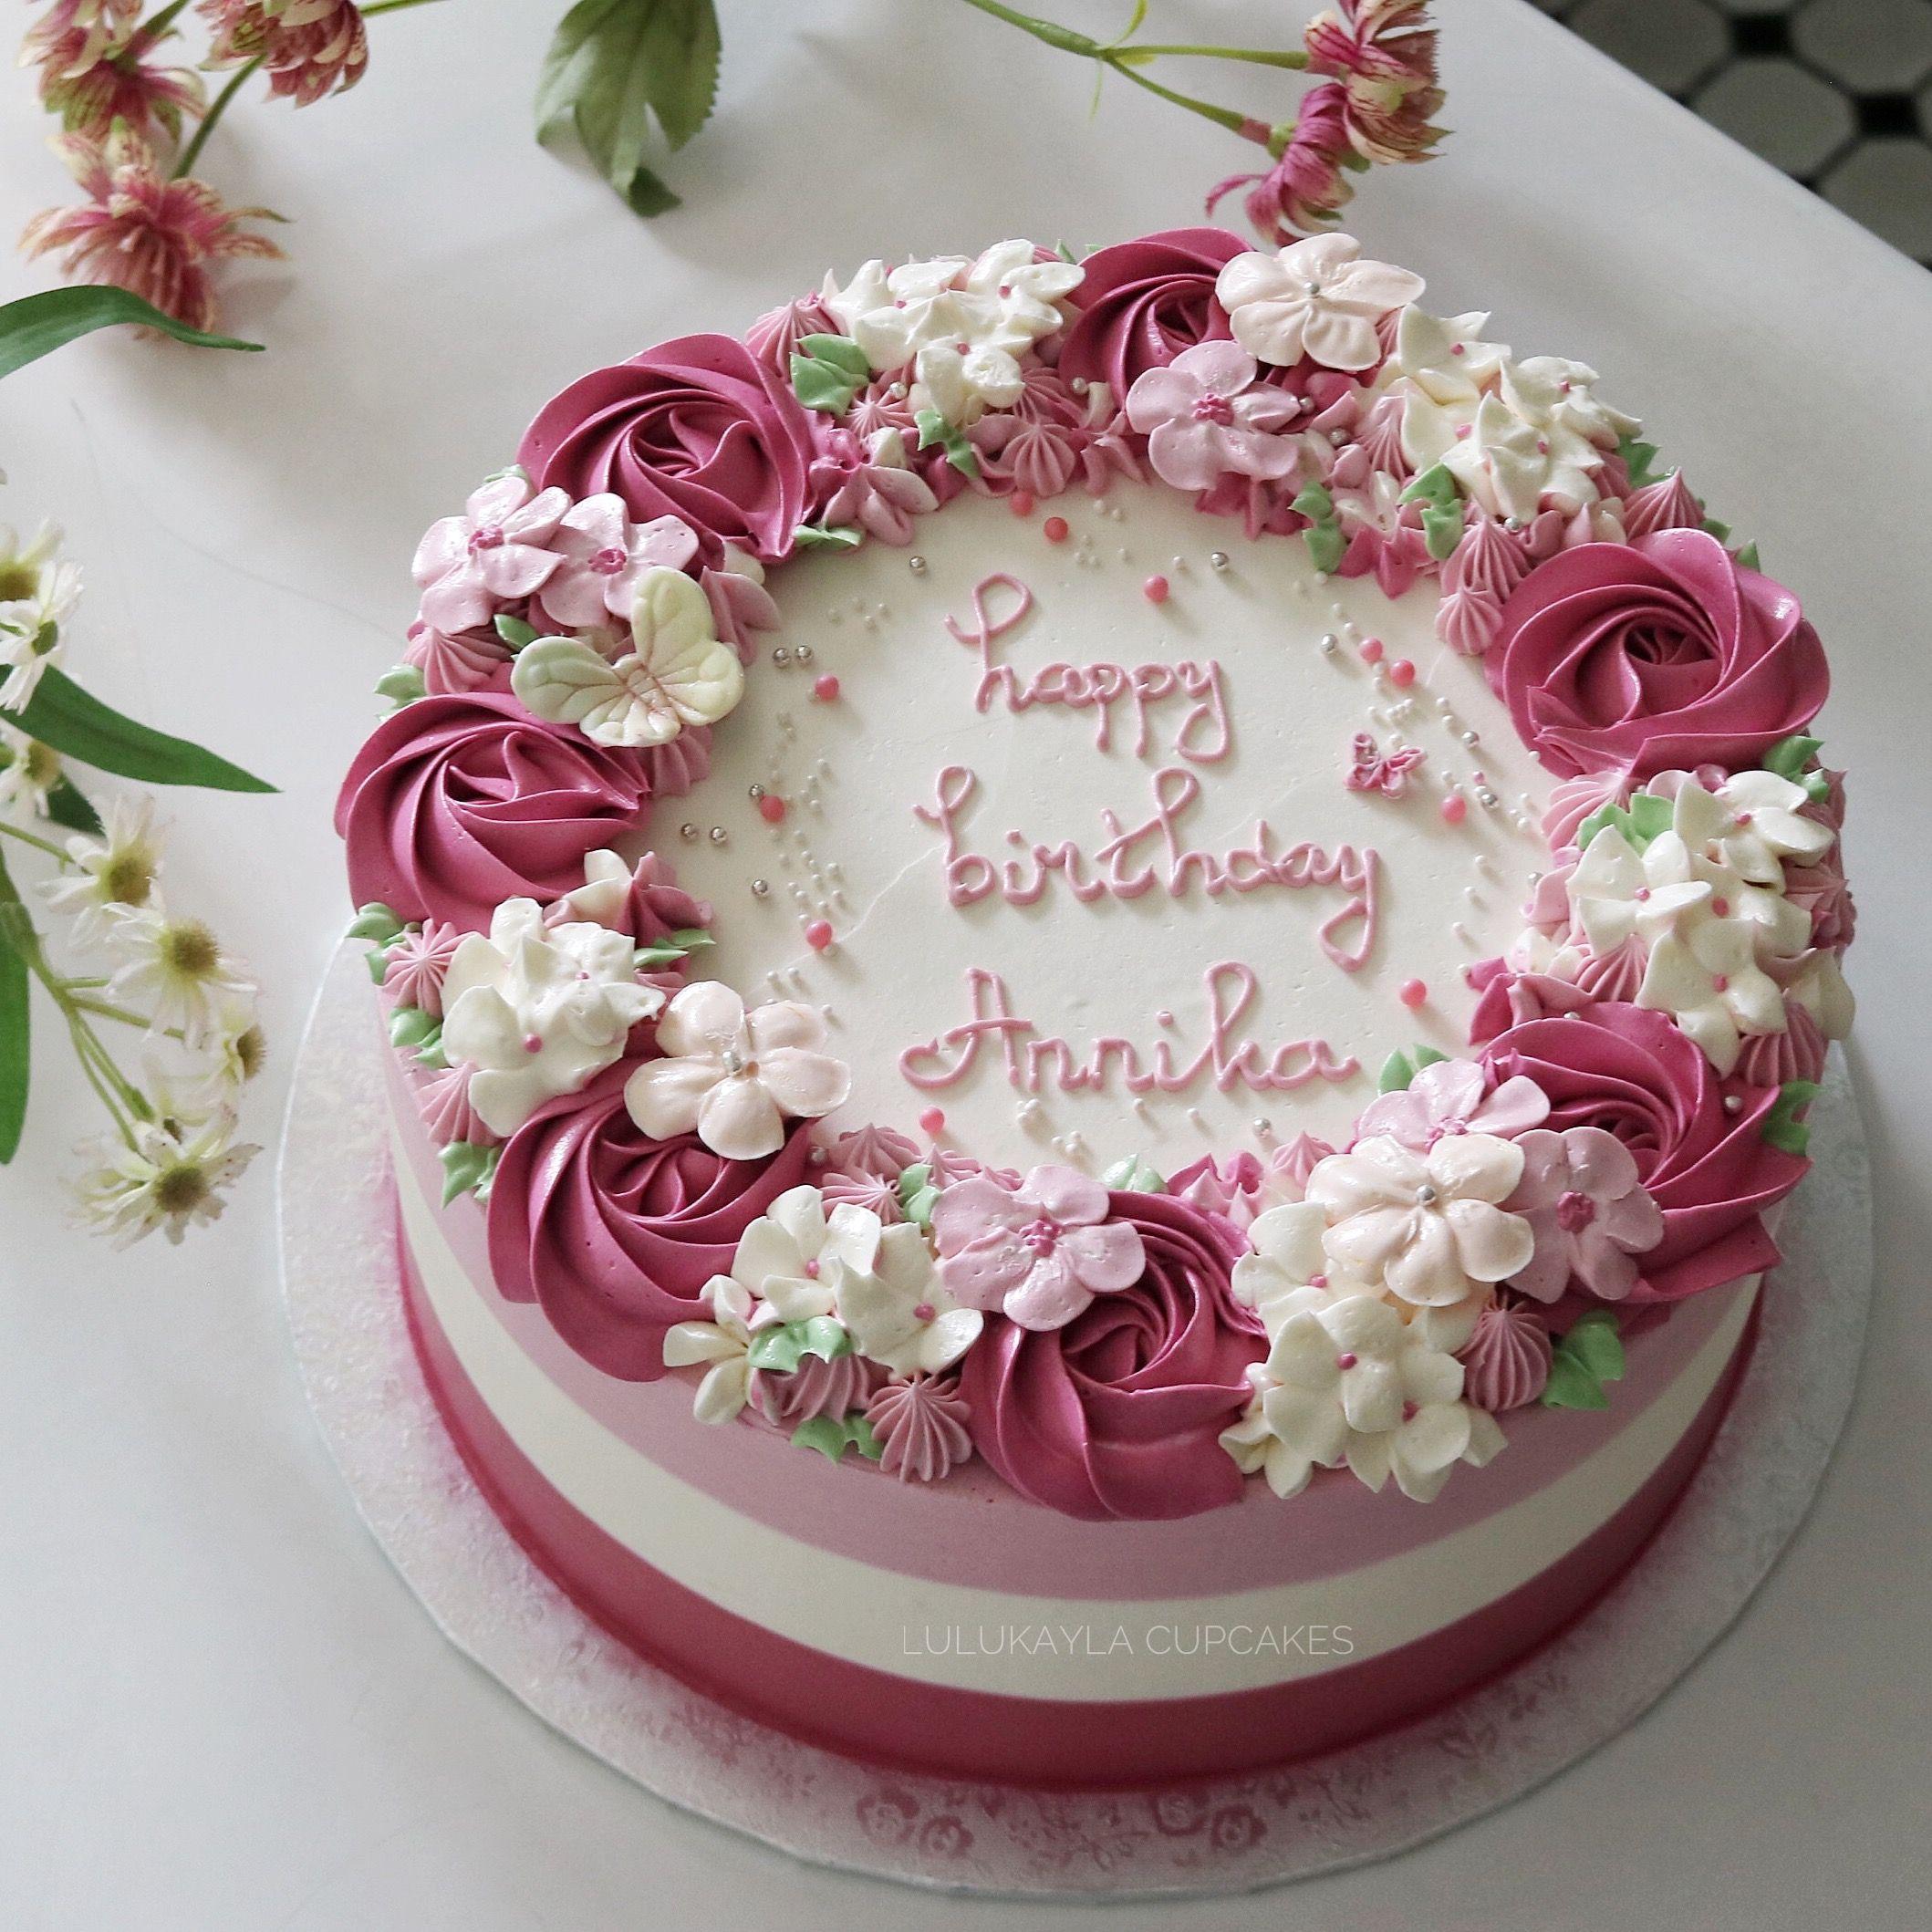 Stupendous Flower Buttercream Cake Housewarming Cake Round Birthday Cakes Funny Birthday Cards Online Hendilapandamsfinfo